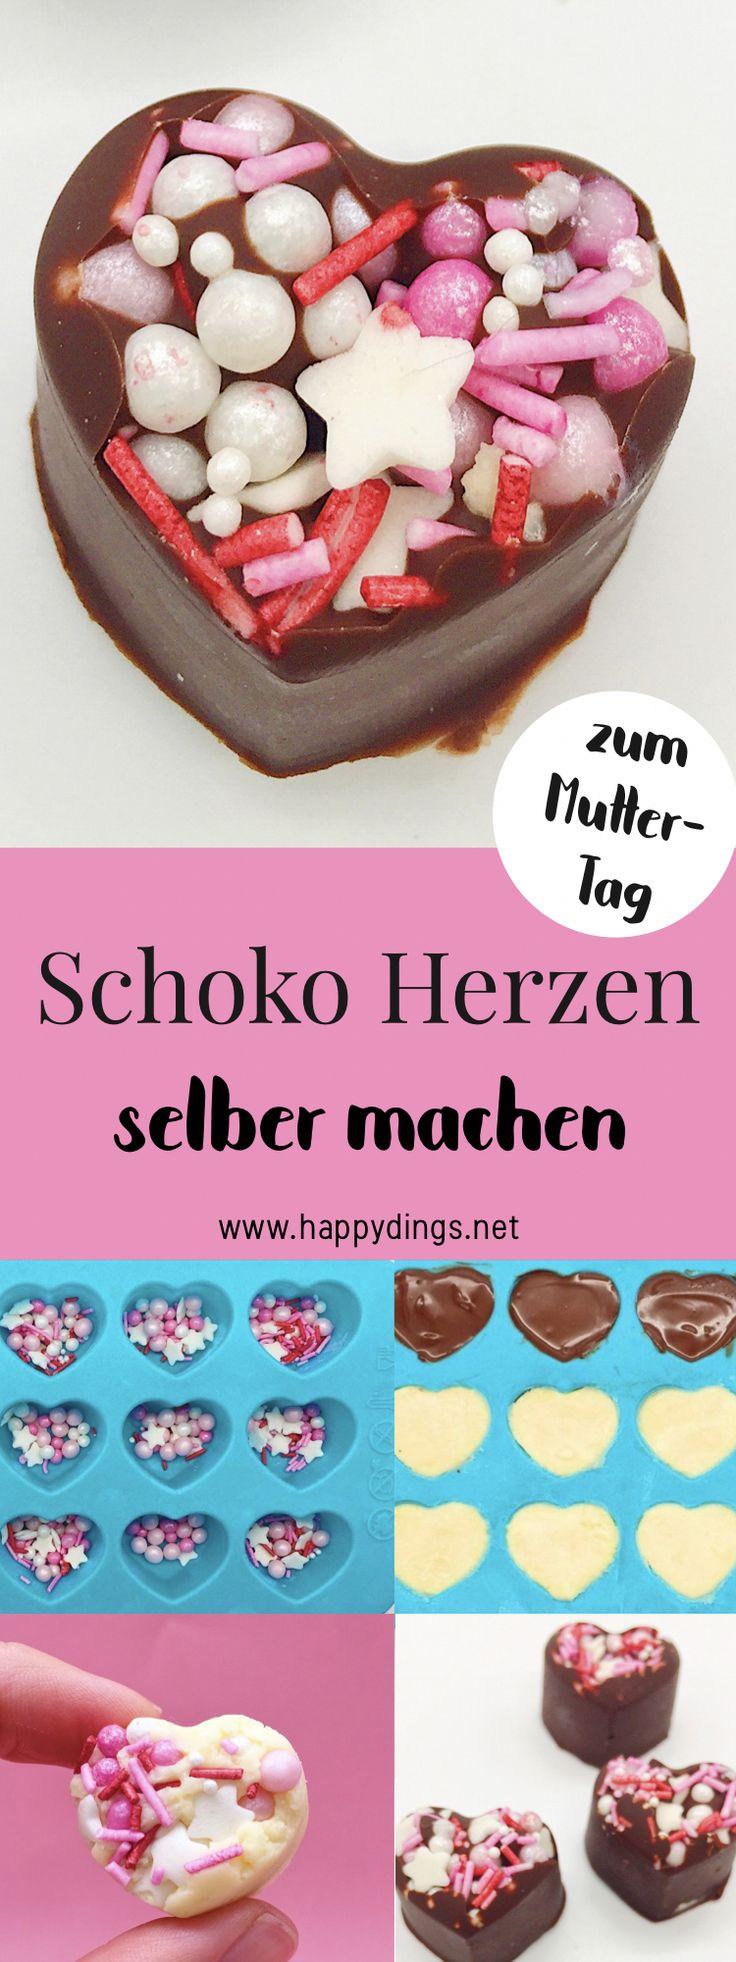 Schokoladenherzen selber machen – einfache Geschenkideen   – Happy Dings • DIY Tipps